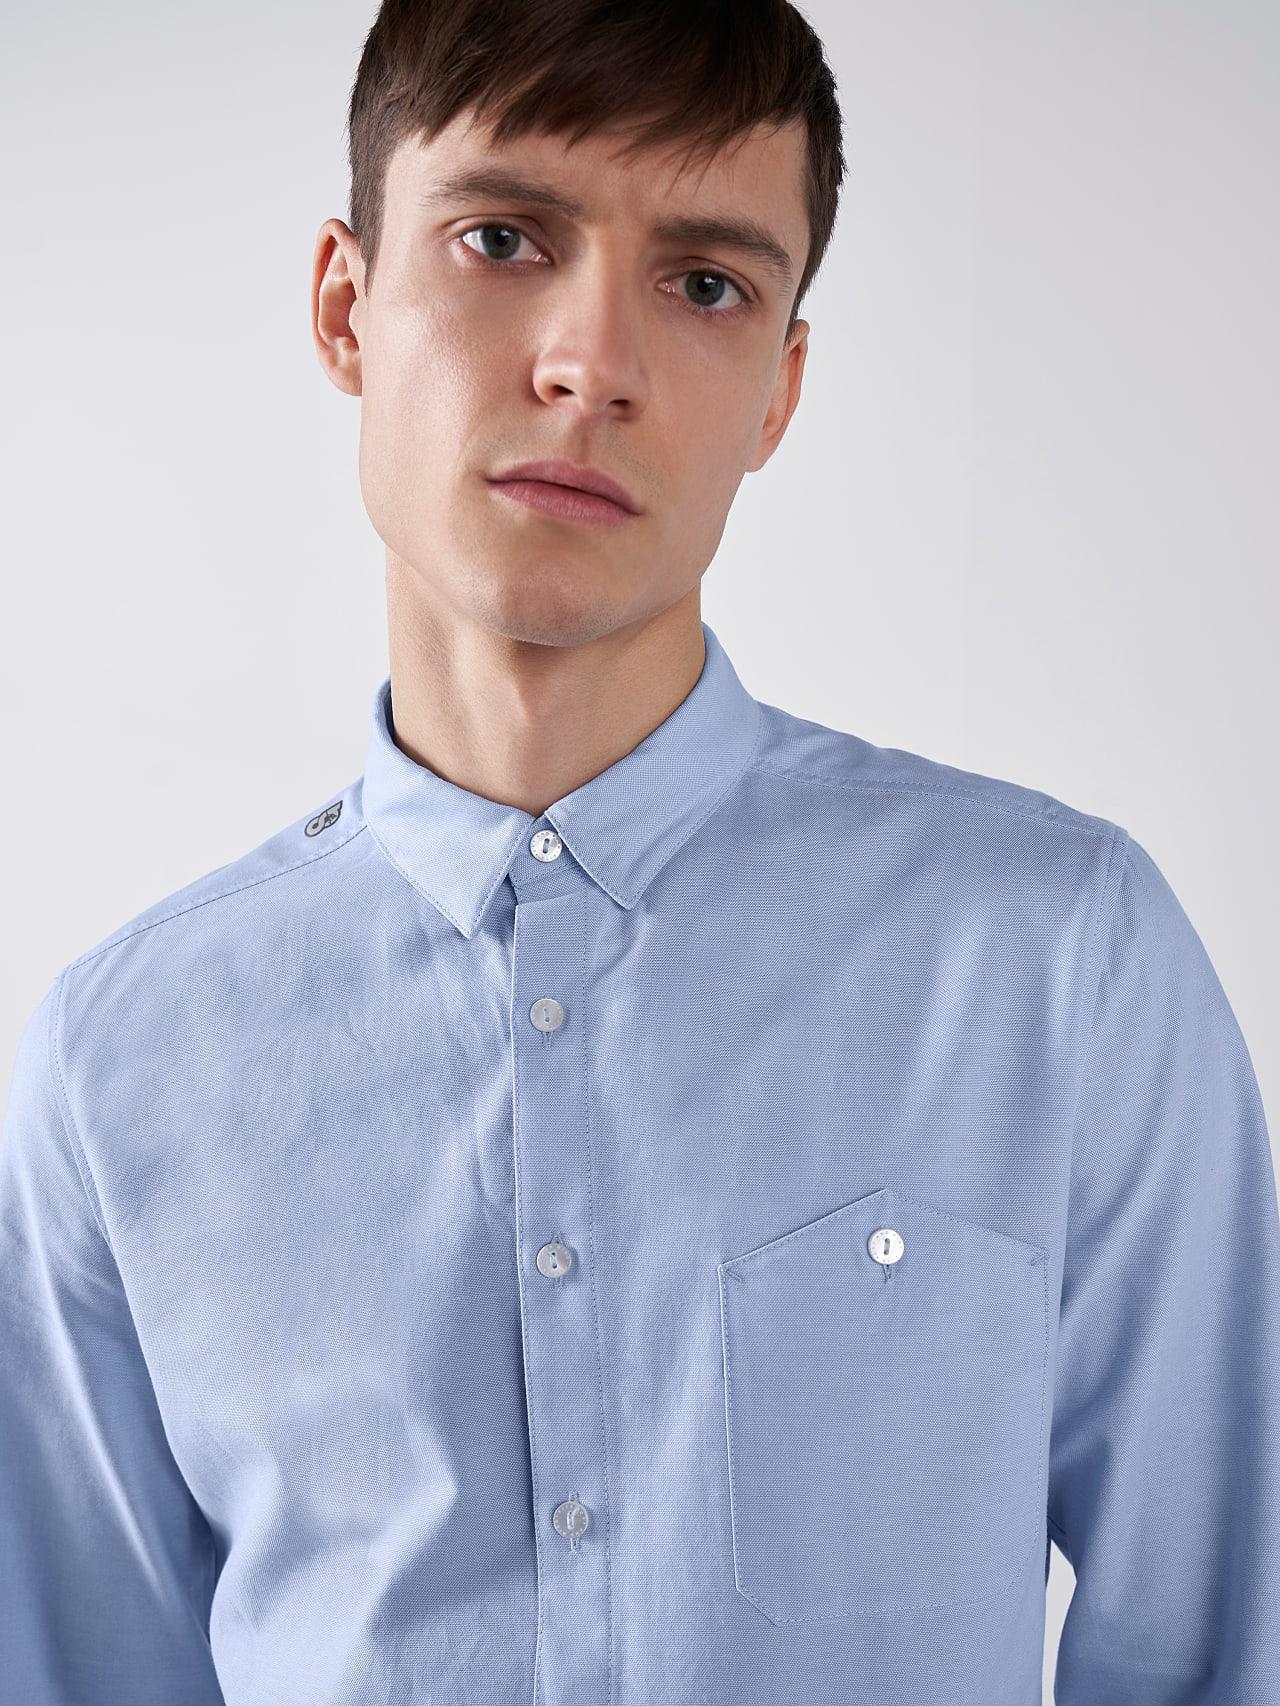 WOSKA V2.Y5.01 Kent Collar Oxford Shirt light blue Model shot Alpha Tauri